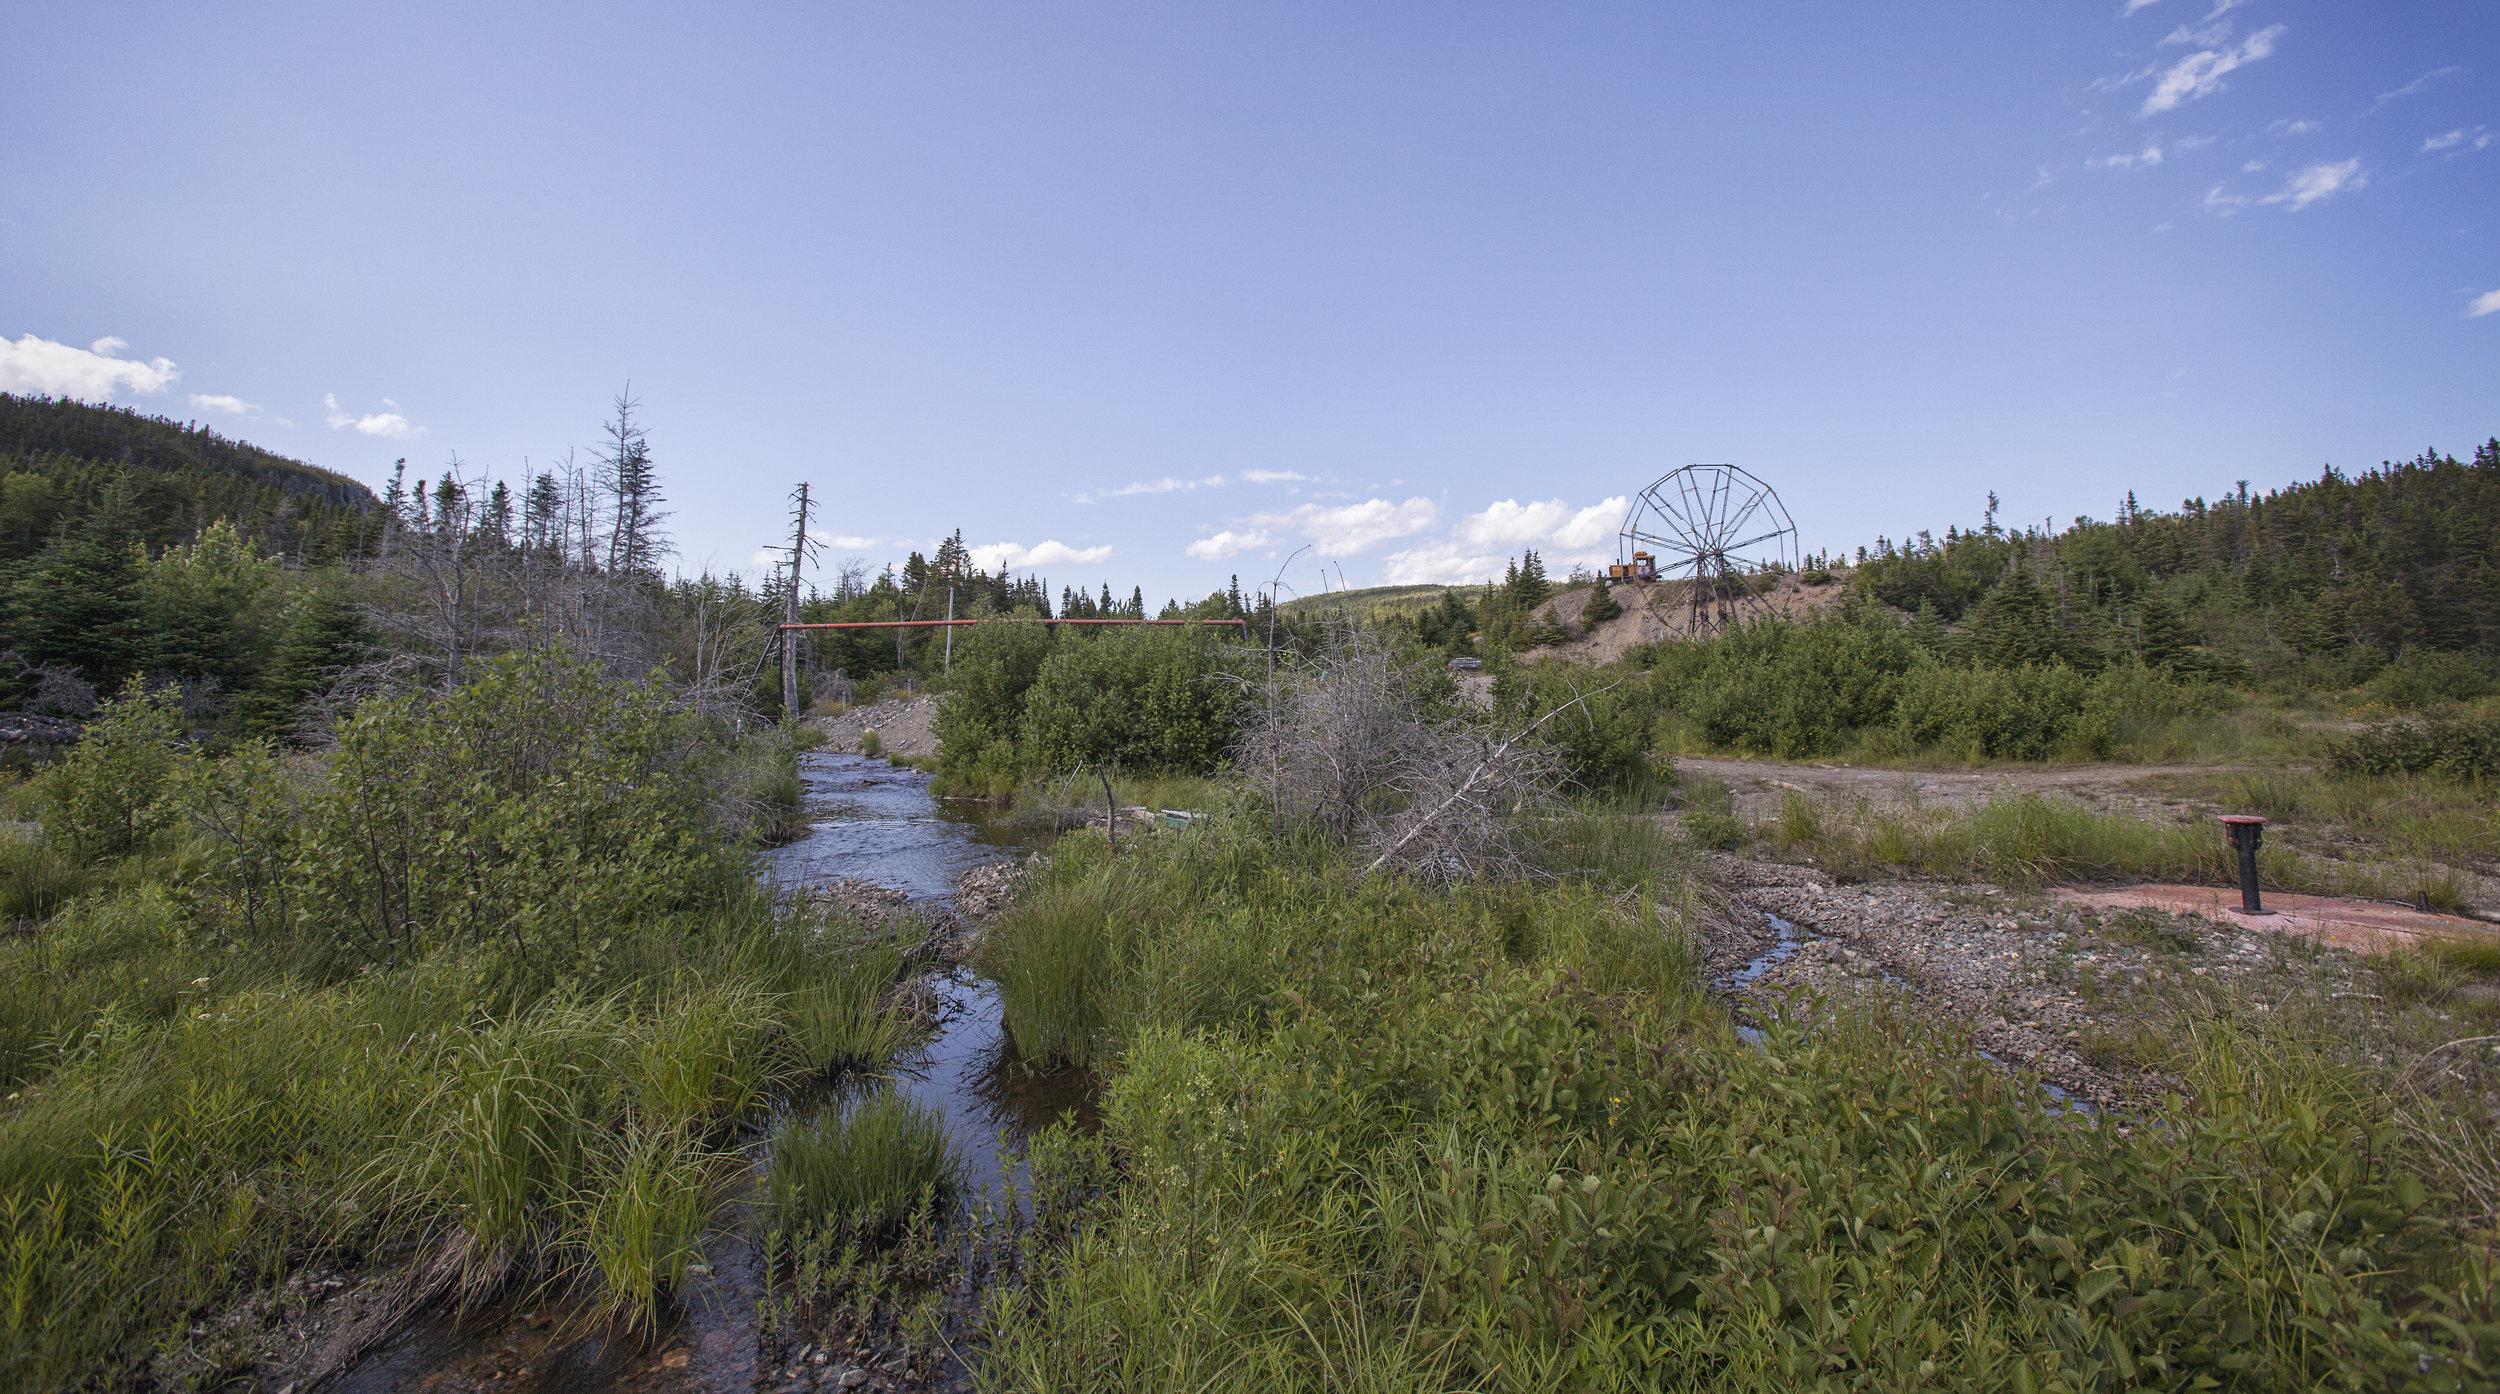 Trinity Loop Amusement Park - Across the Blue Planet